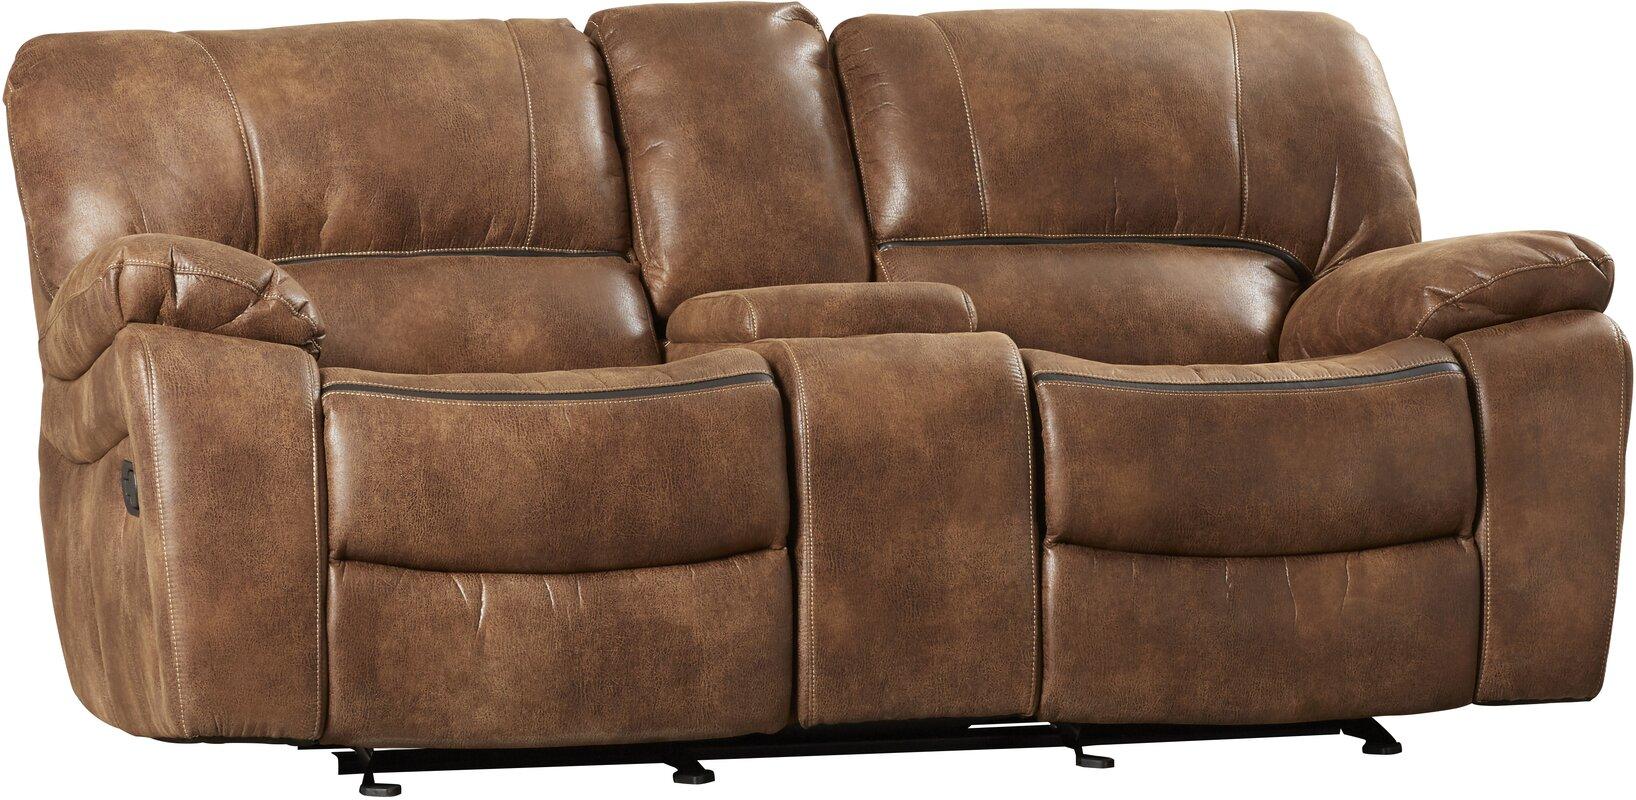 Hattiesburg Dual Rocking Reclining Sofa